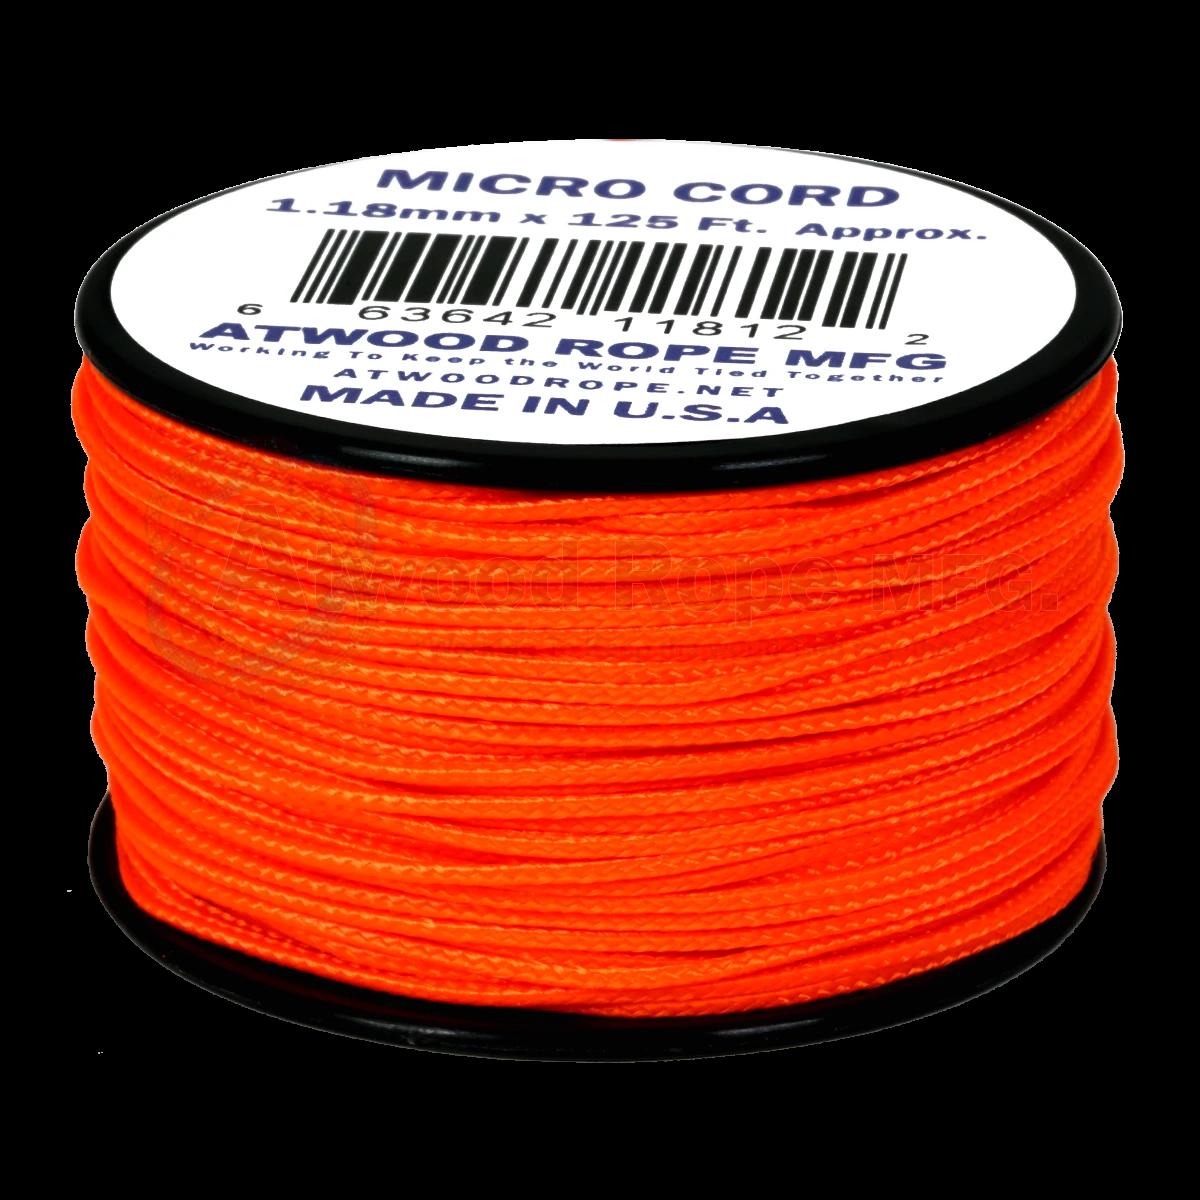 Dụng cụ du lịch Dây Micro Cord 1.18mm – 100ft – Neon Orange